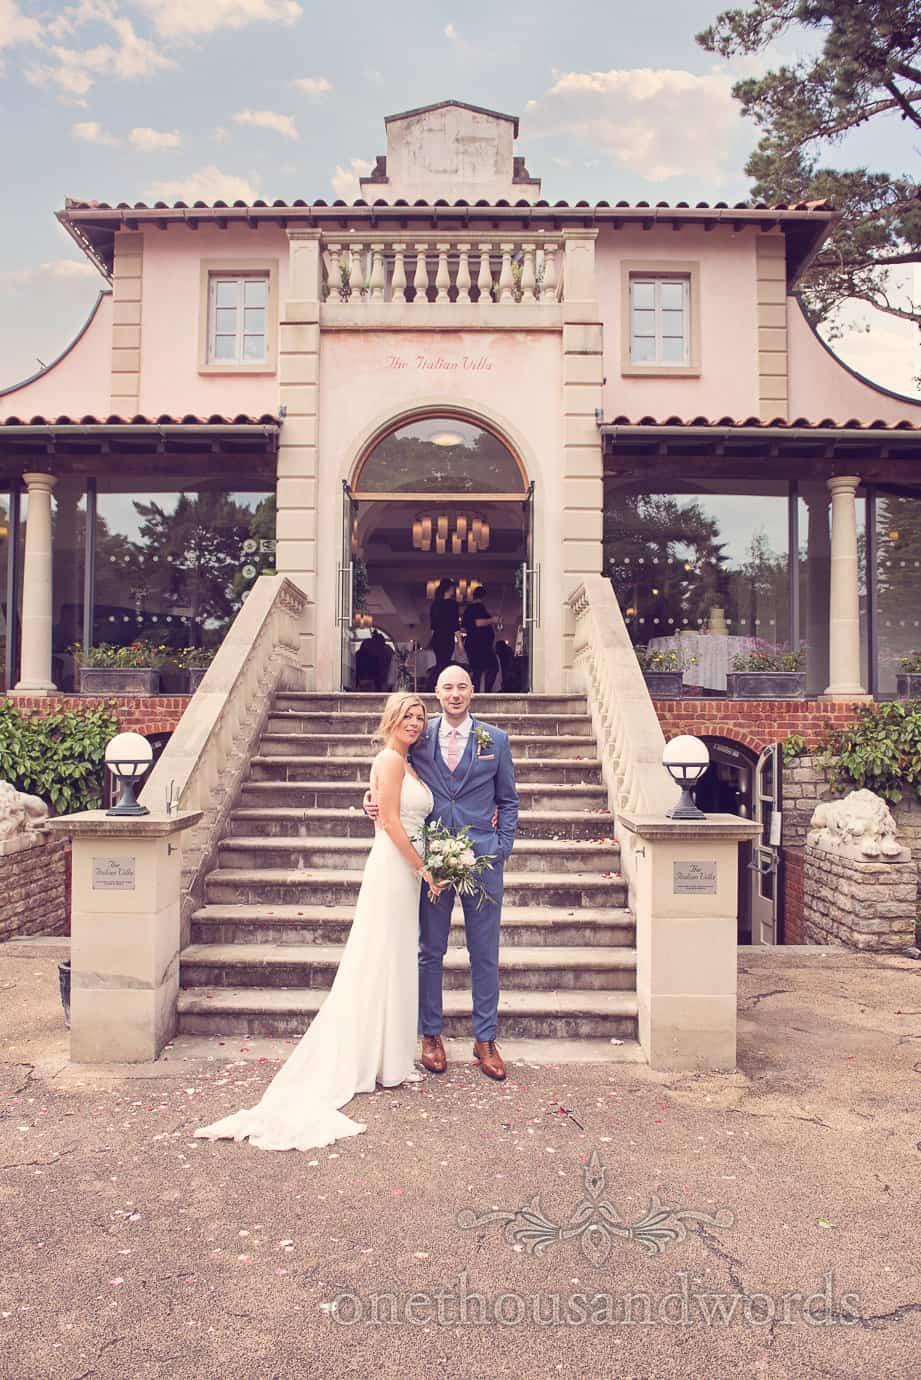 Wedding couple at bottom of stairs at Italian Villa wedding photographs